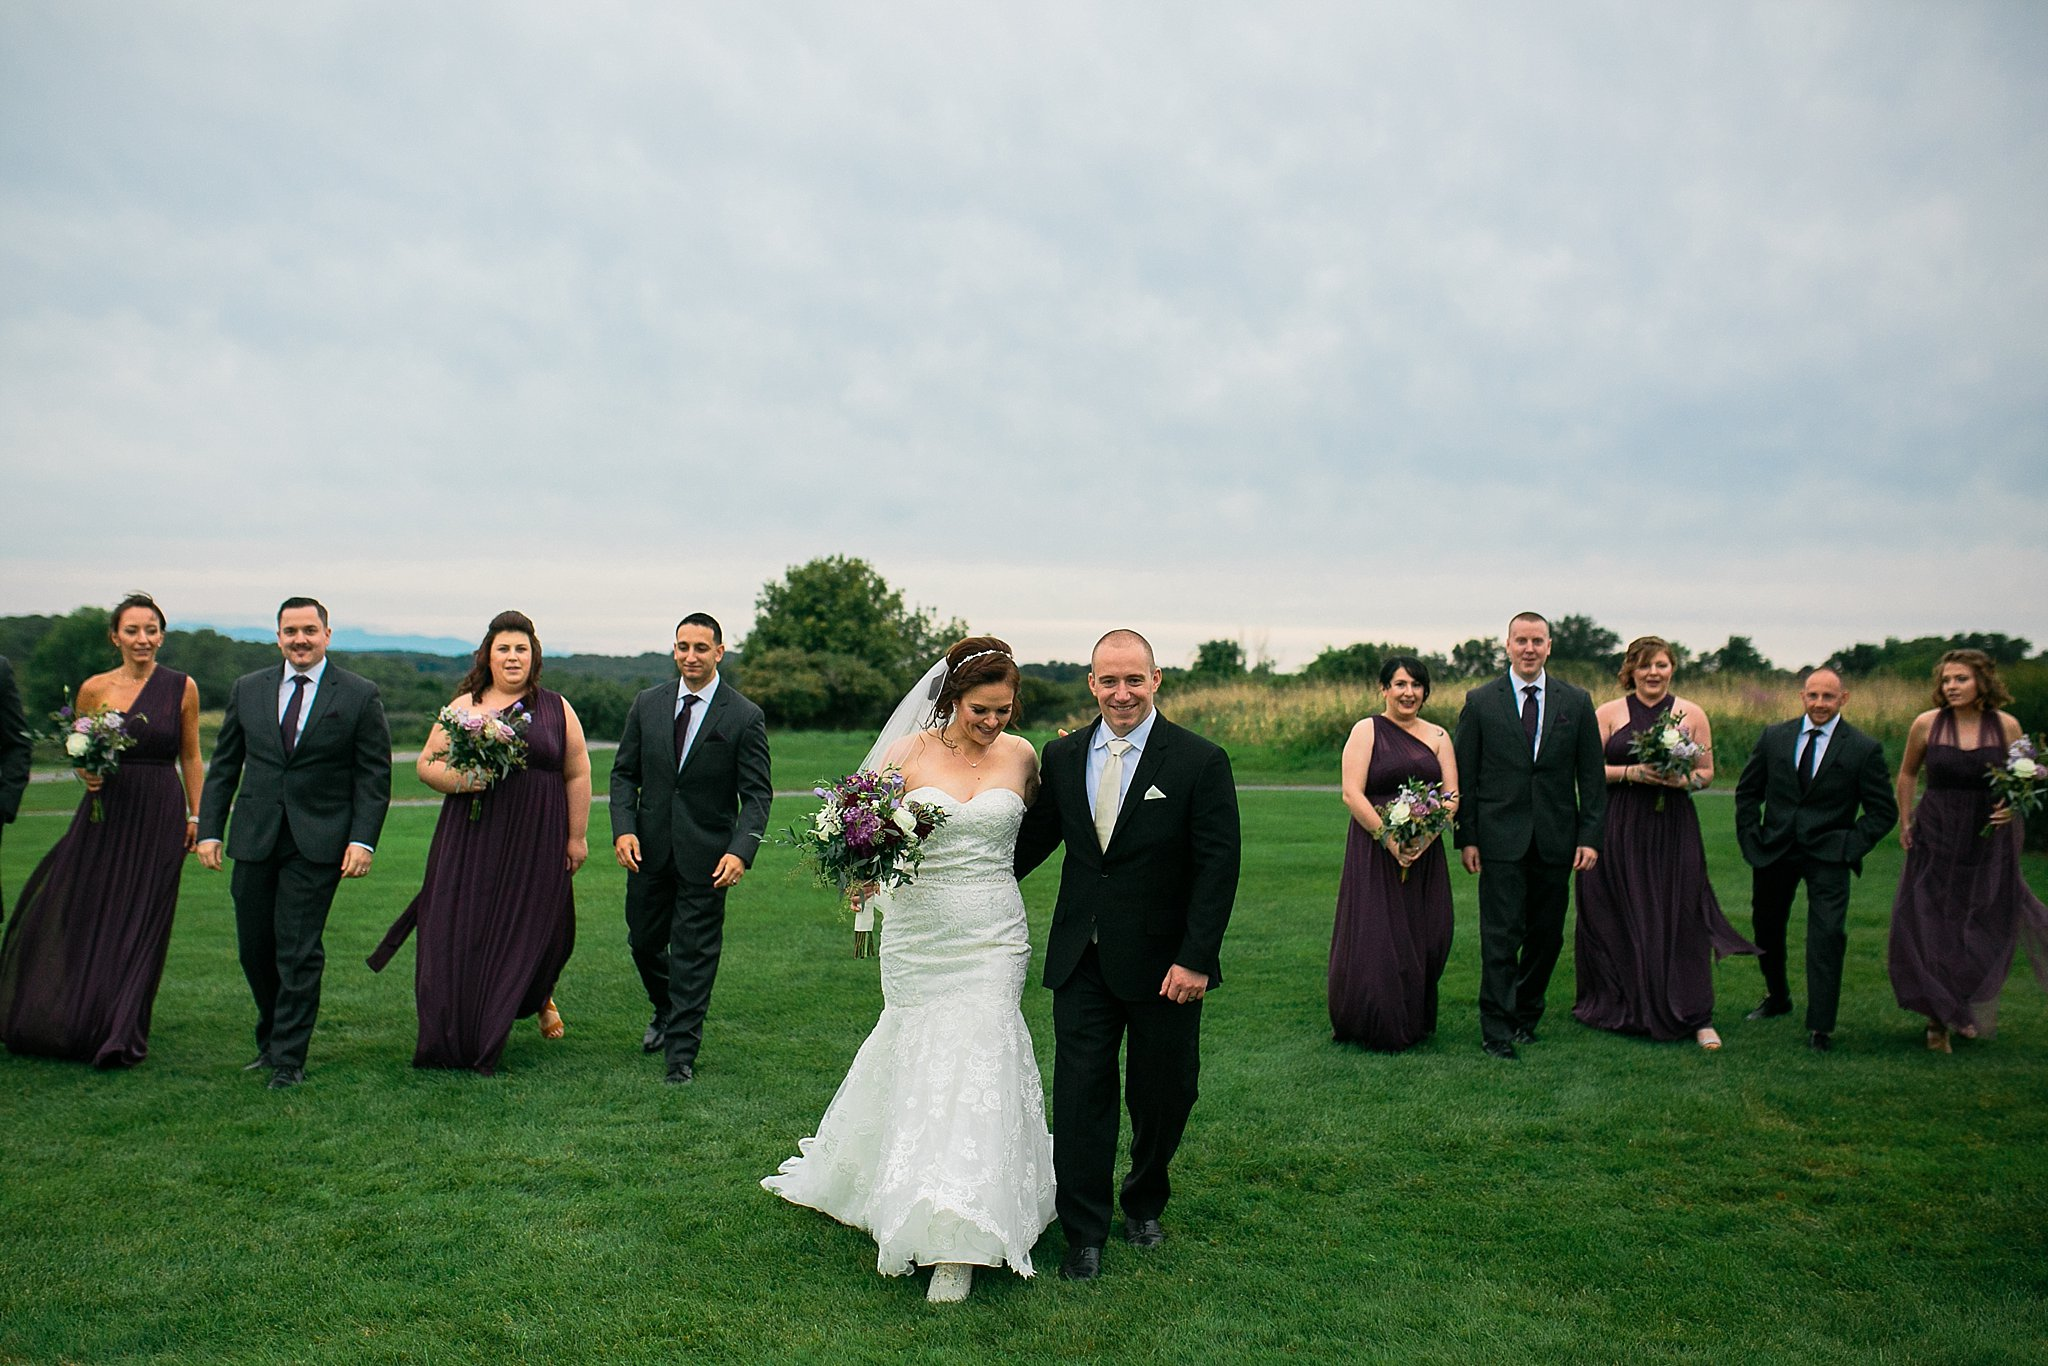 Links at Unionvale Wedding Lagrangeville Wedding Hudson Valley Wedding Photographer Sweet Alice Photography43.jpg